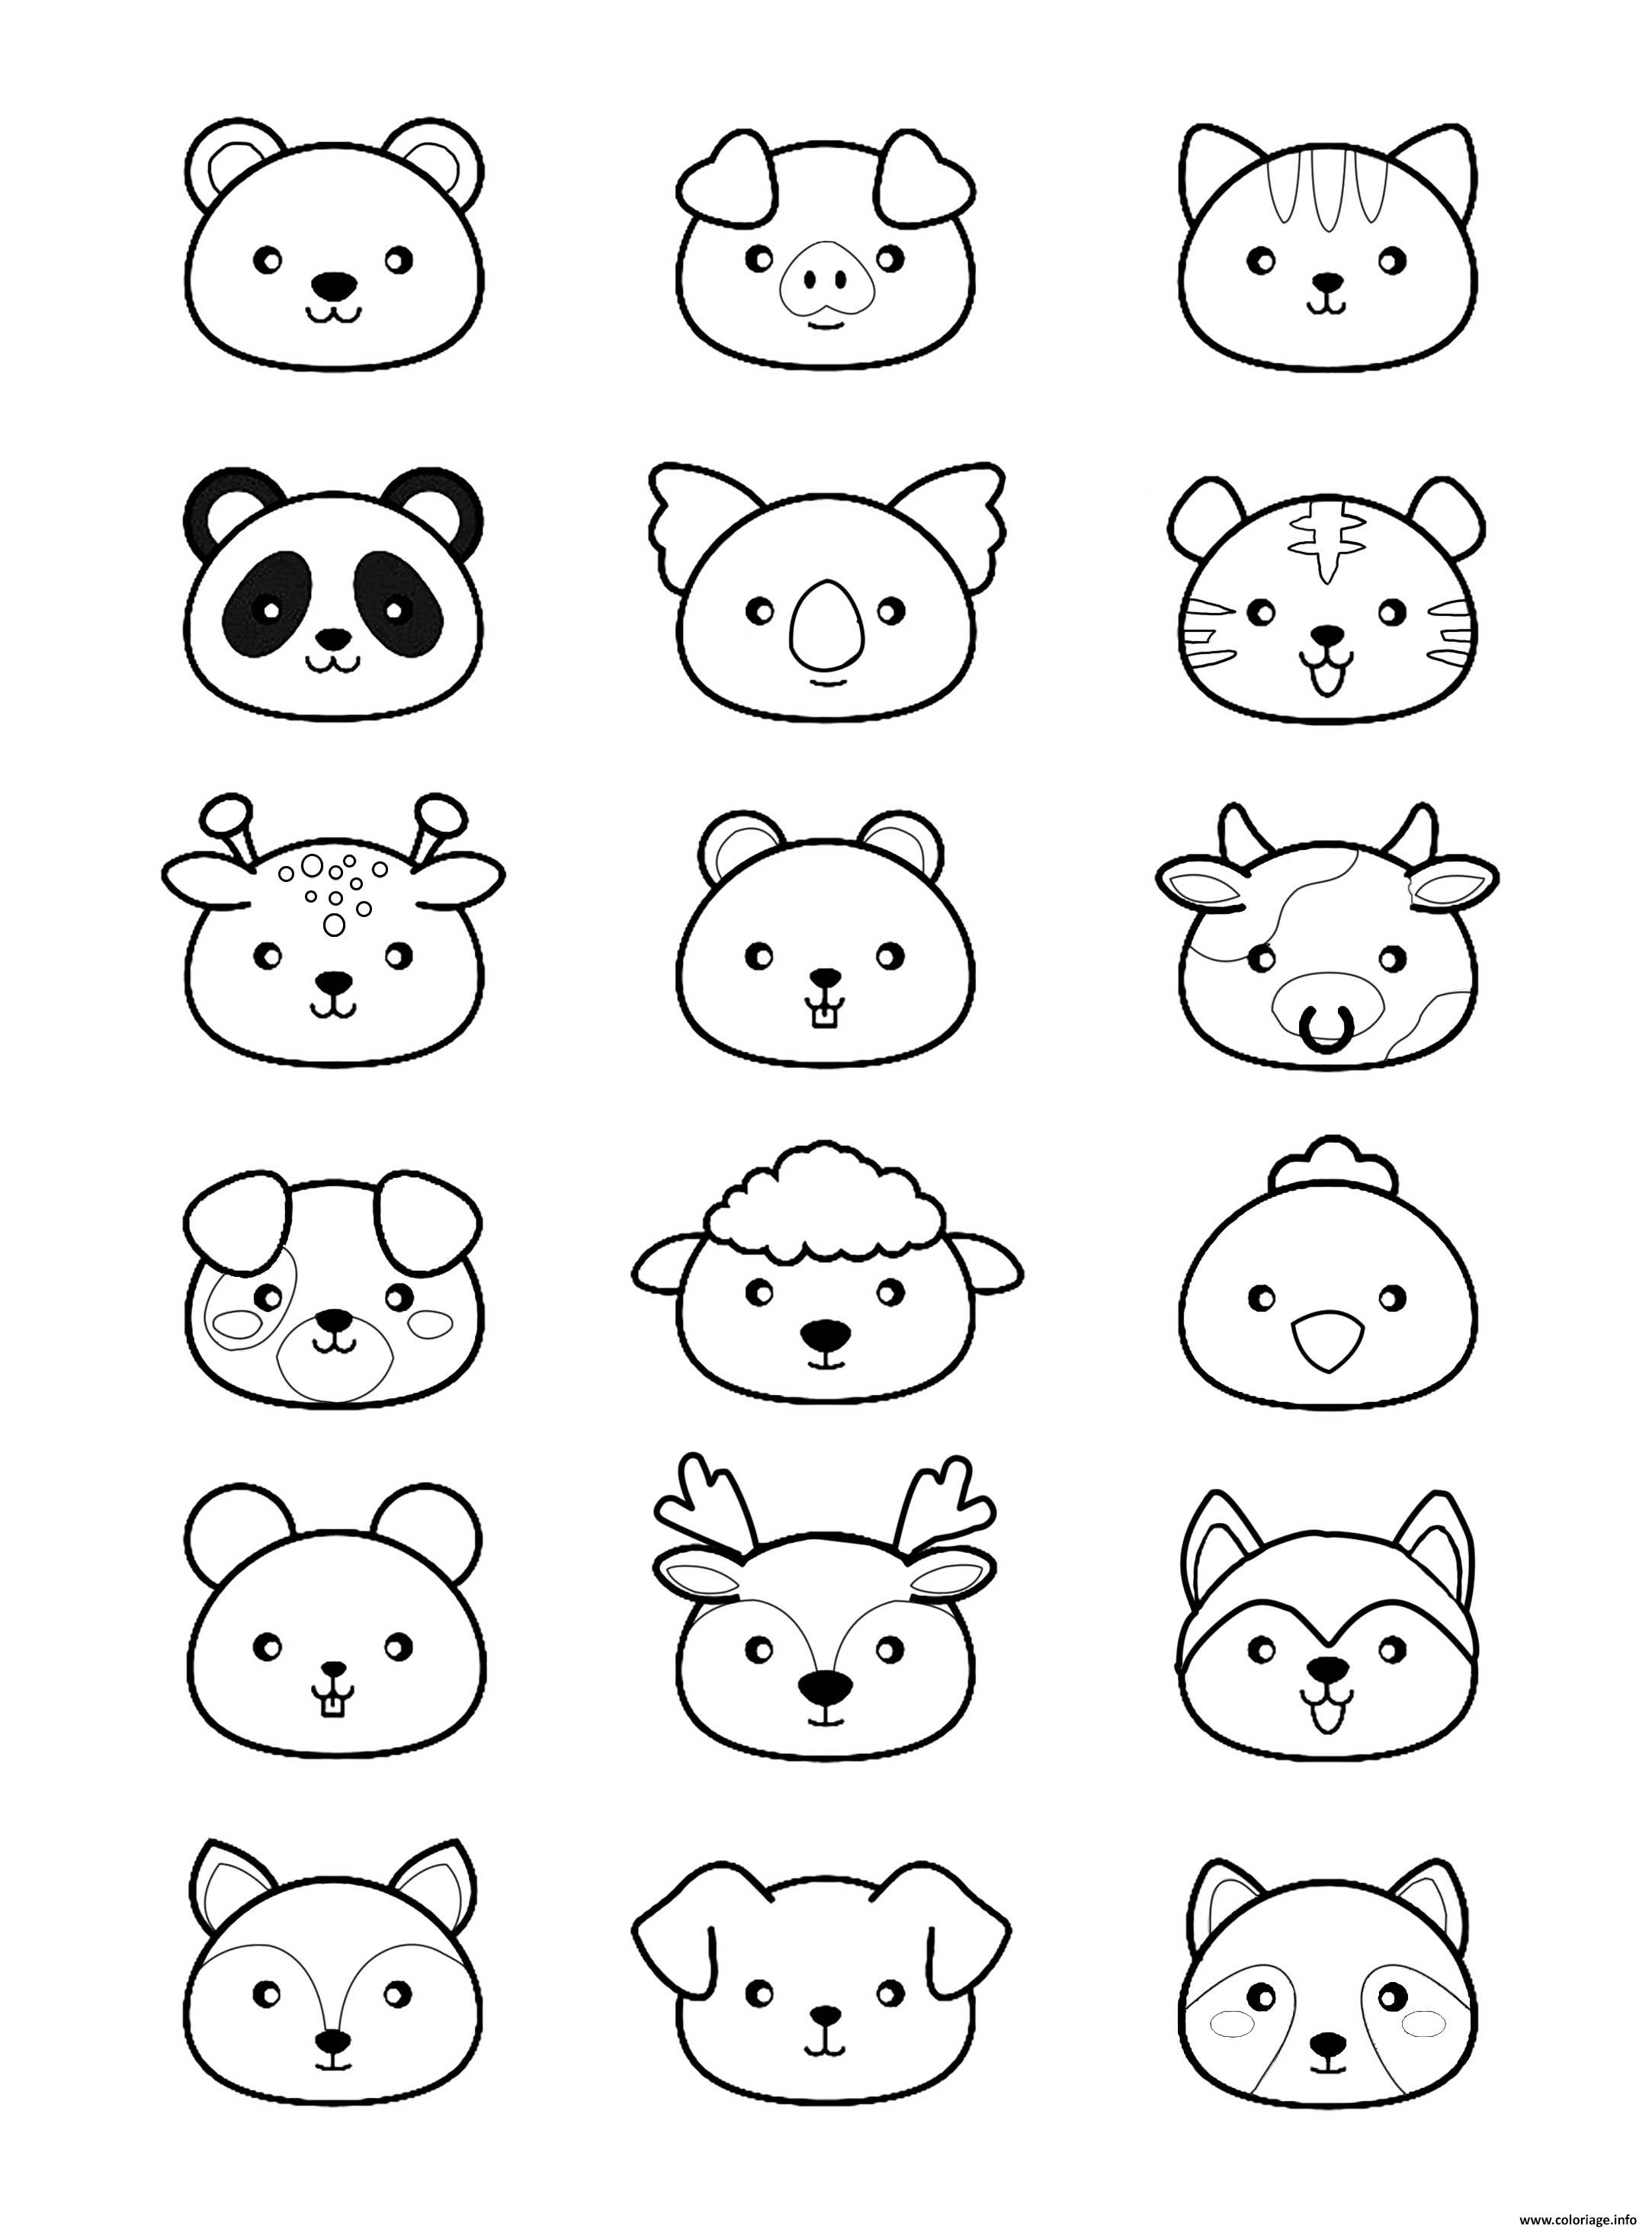 Kawaii Facile Dessin Kawaii : kawaii, facile, dessin, Coloriage, Animaux, Kawaii, Dessin, Imprimer